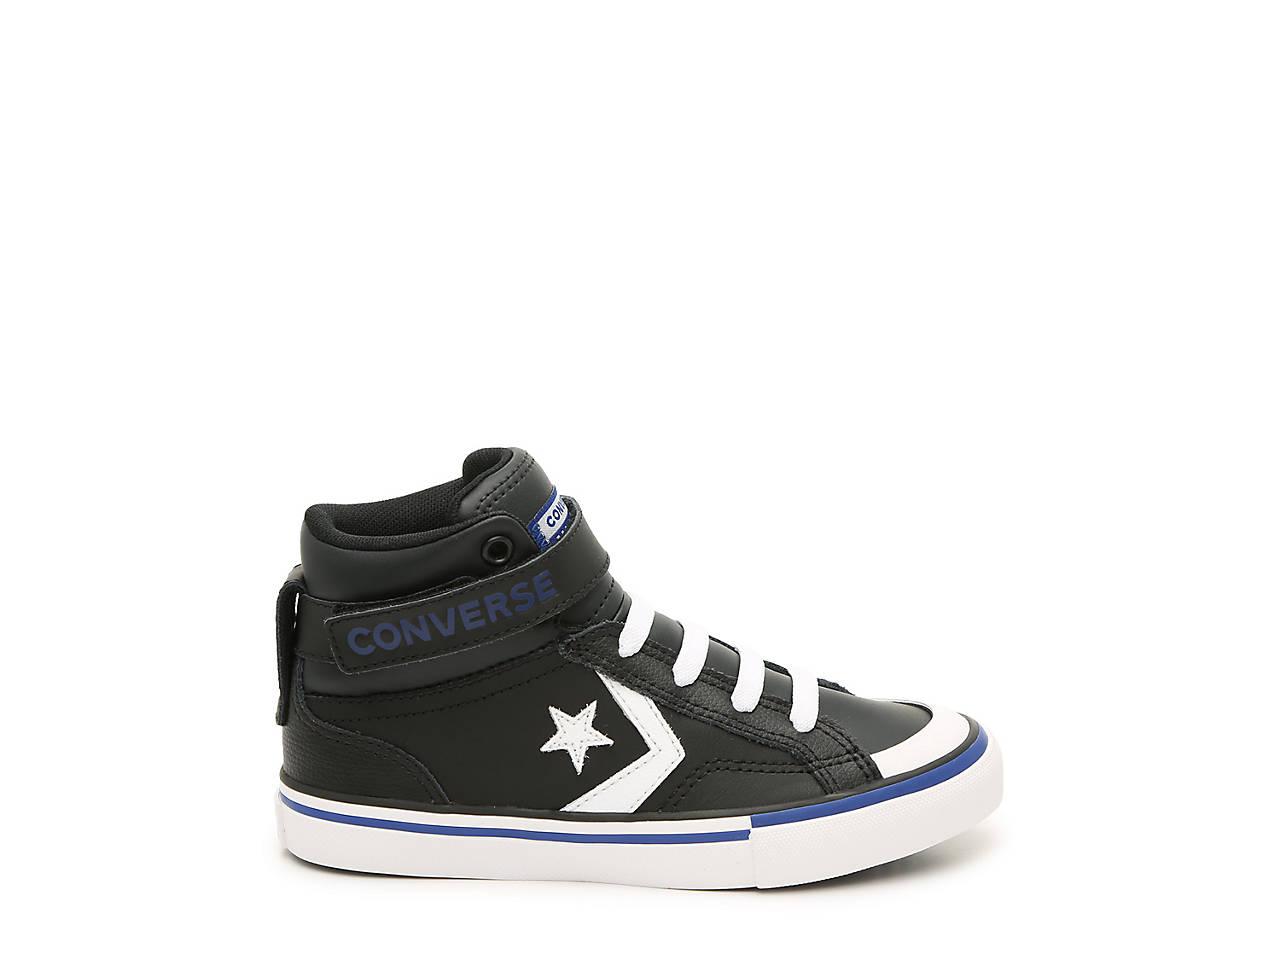 Converse Chuck Taylor All Star Pro Blaze High Top Sneaker